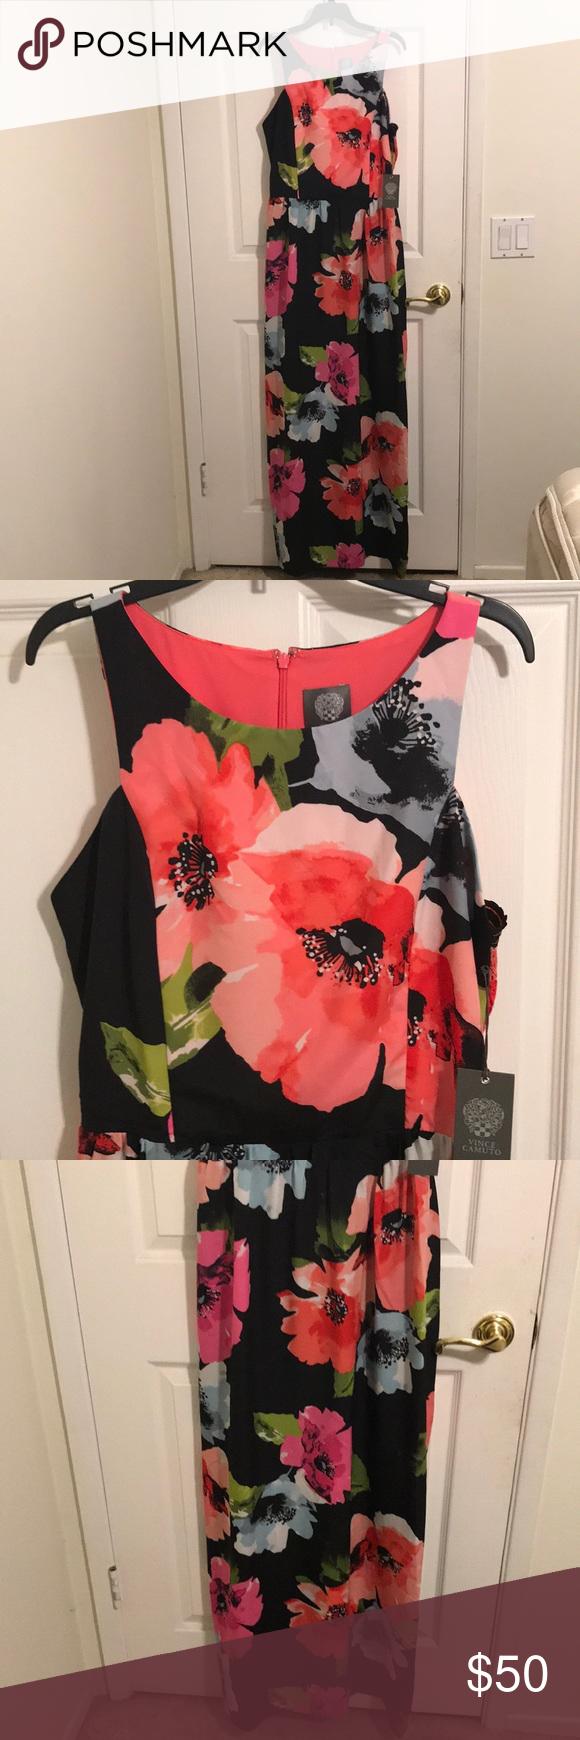 Vince Camuto Printed Maxi Dress Dresses Women Macy S Maxi Dress Printed Maxi Dress Dresses [ 1467 x 1200 Pixel ]